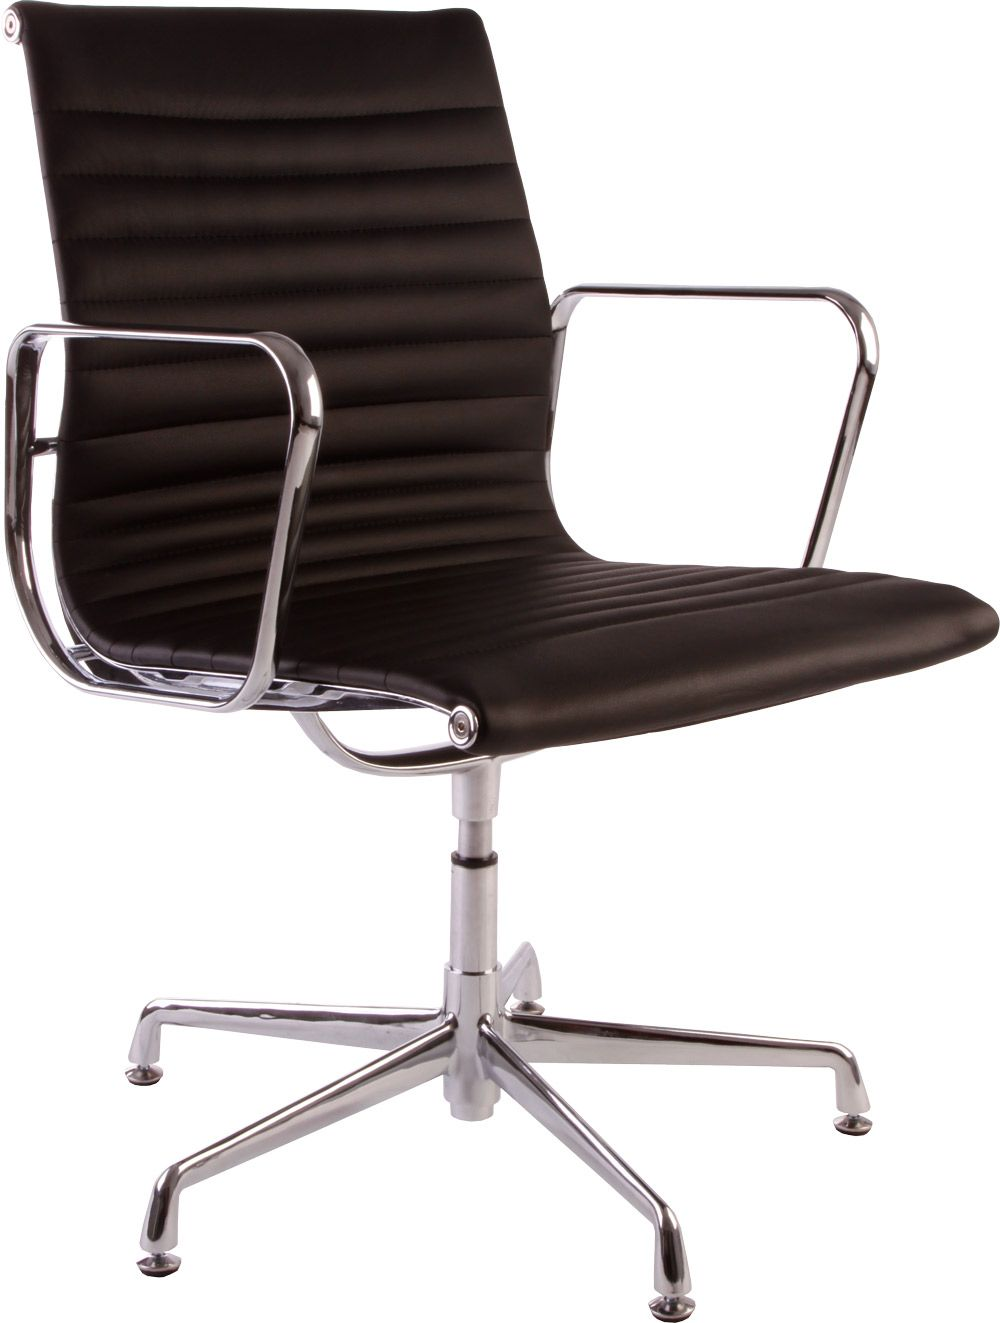 Marvelous Replica Eames Group Standard Aluminium Office Chair Cf Andrewgaddart Wooden Chair Designs For Living Room Andrewgaddartcom